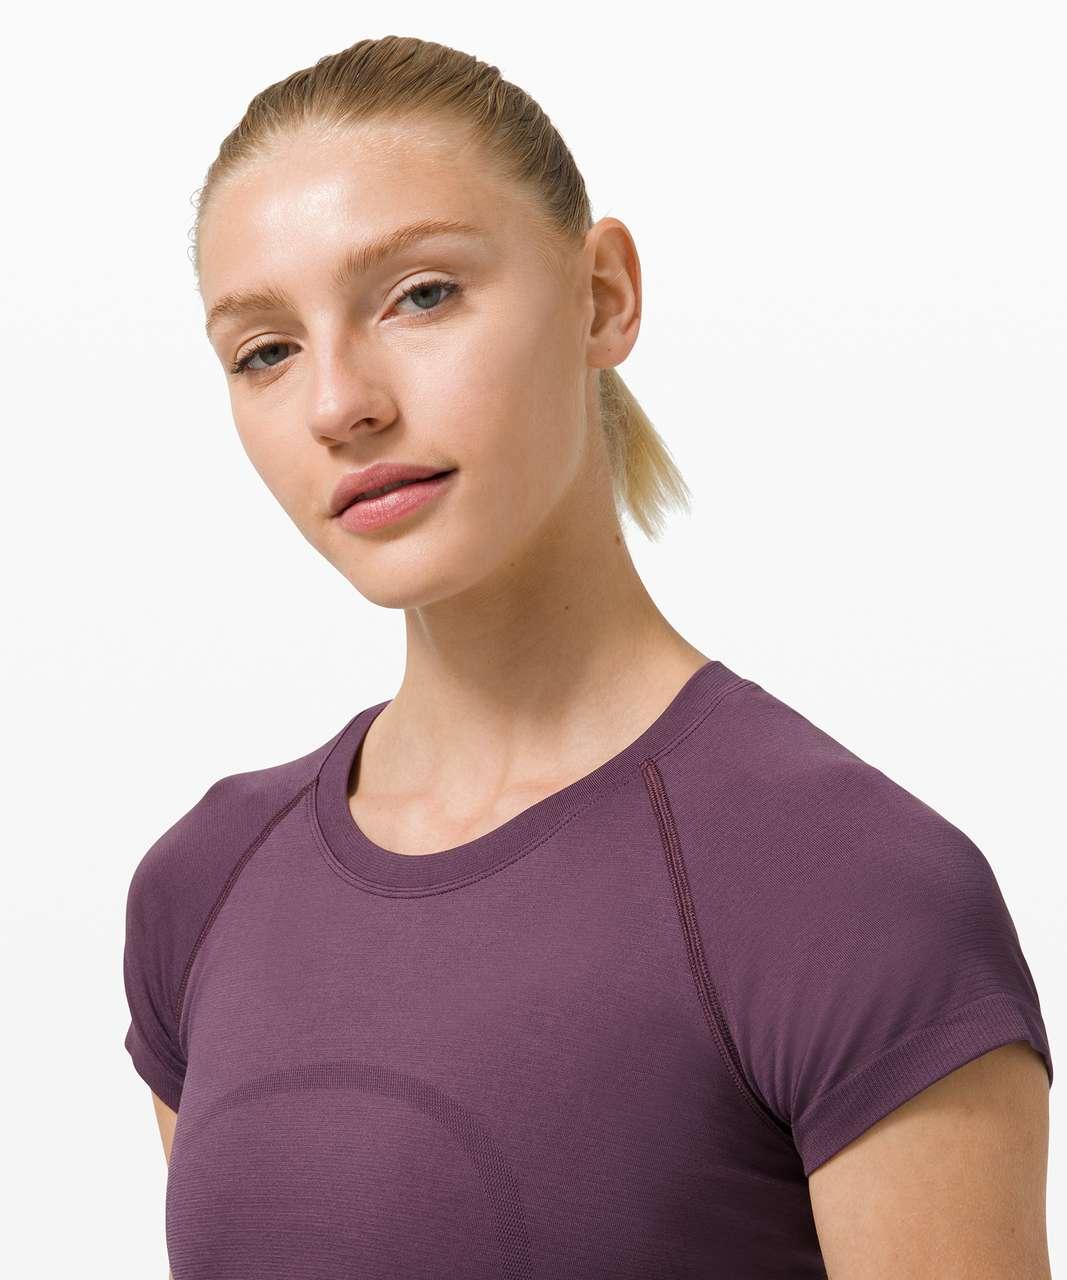 Lululemon Swiftly Tech Short Sleeve 2.0 - Grape Thistle / Grape Thistle